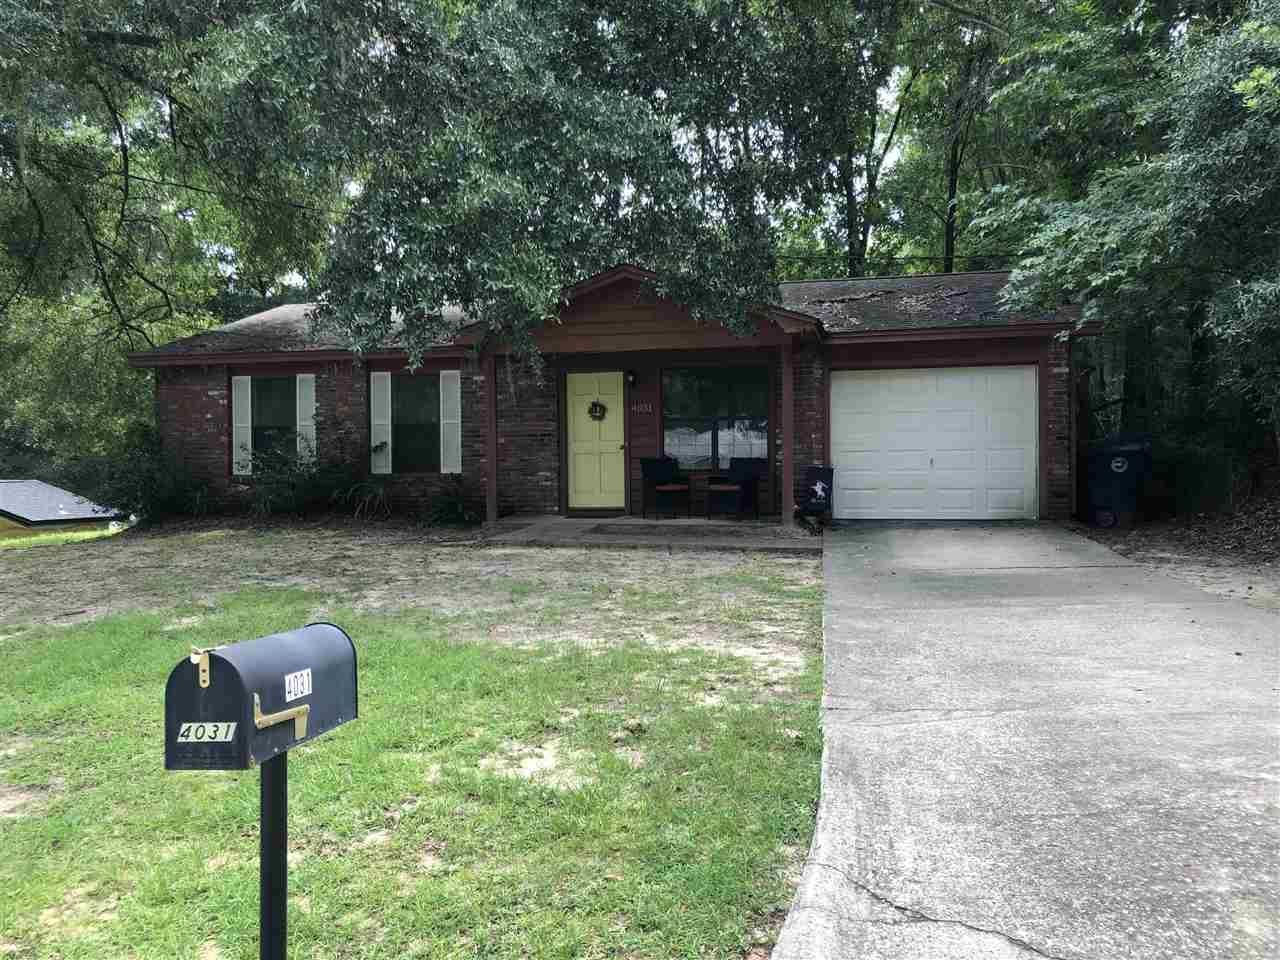 Photo of 4031 Sonnet Drive, TALLAHASSEE, FL 32303 (MLS # 335444)